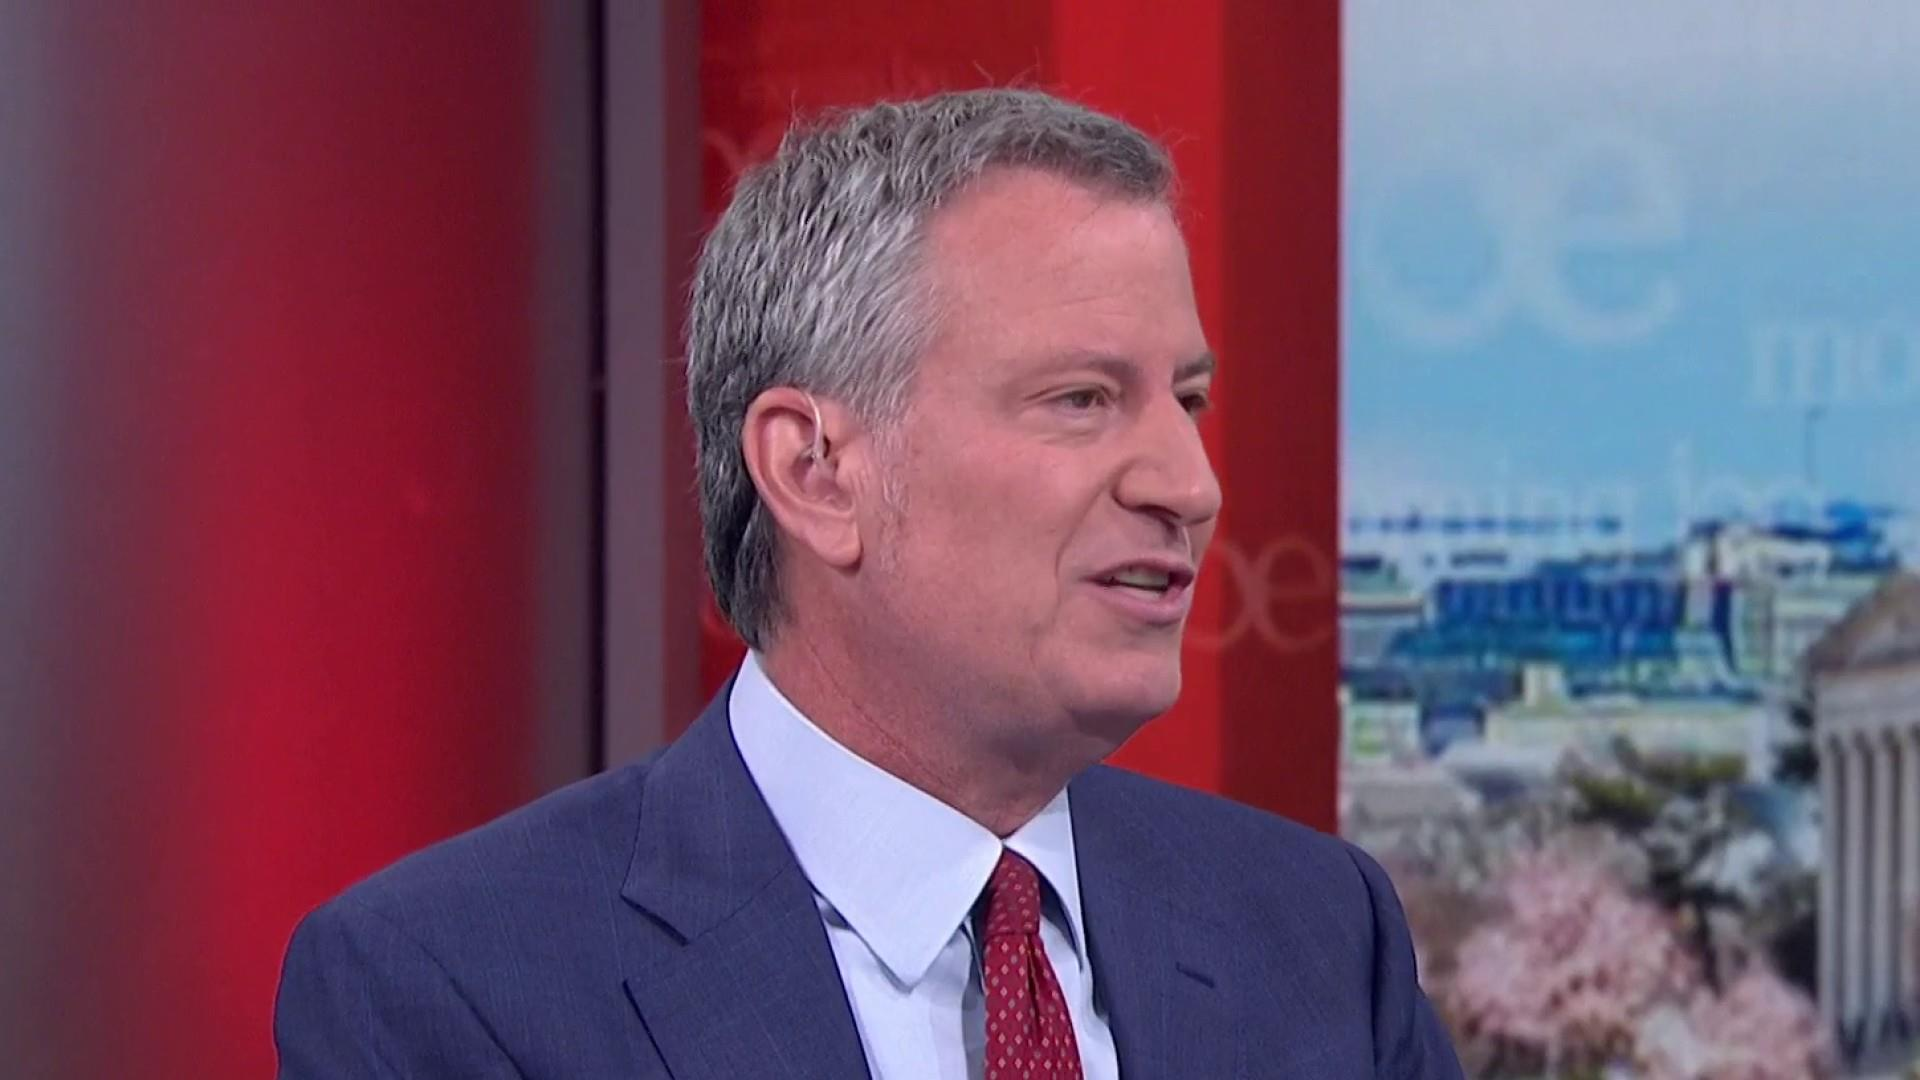 De Blasio: Trump has said to my face NYC is a safe city